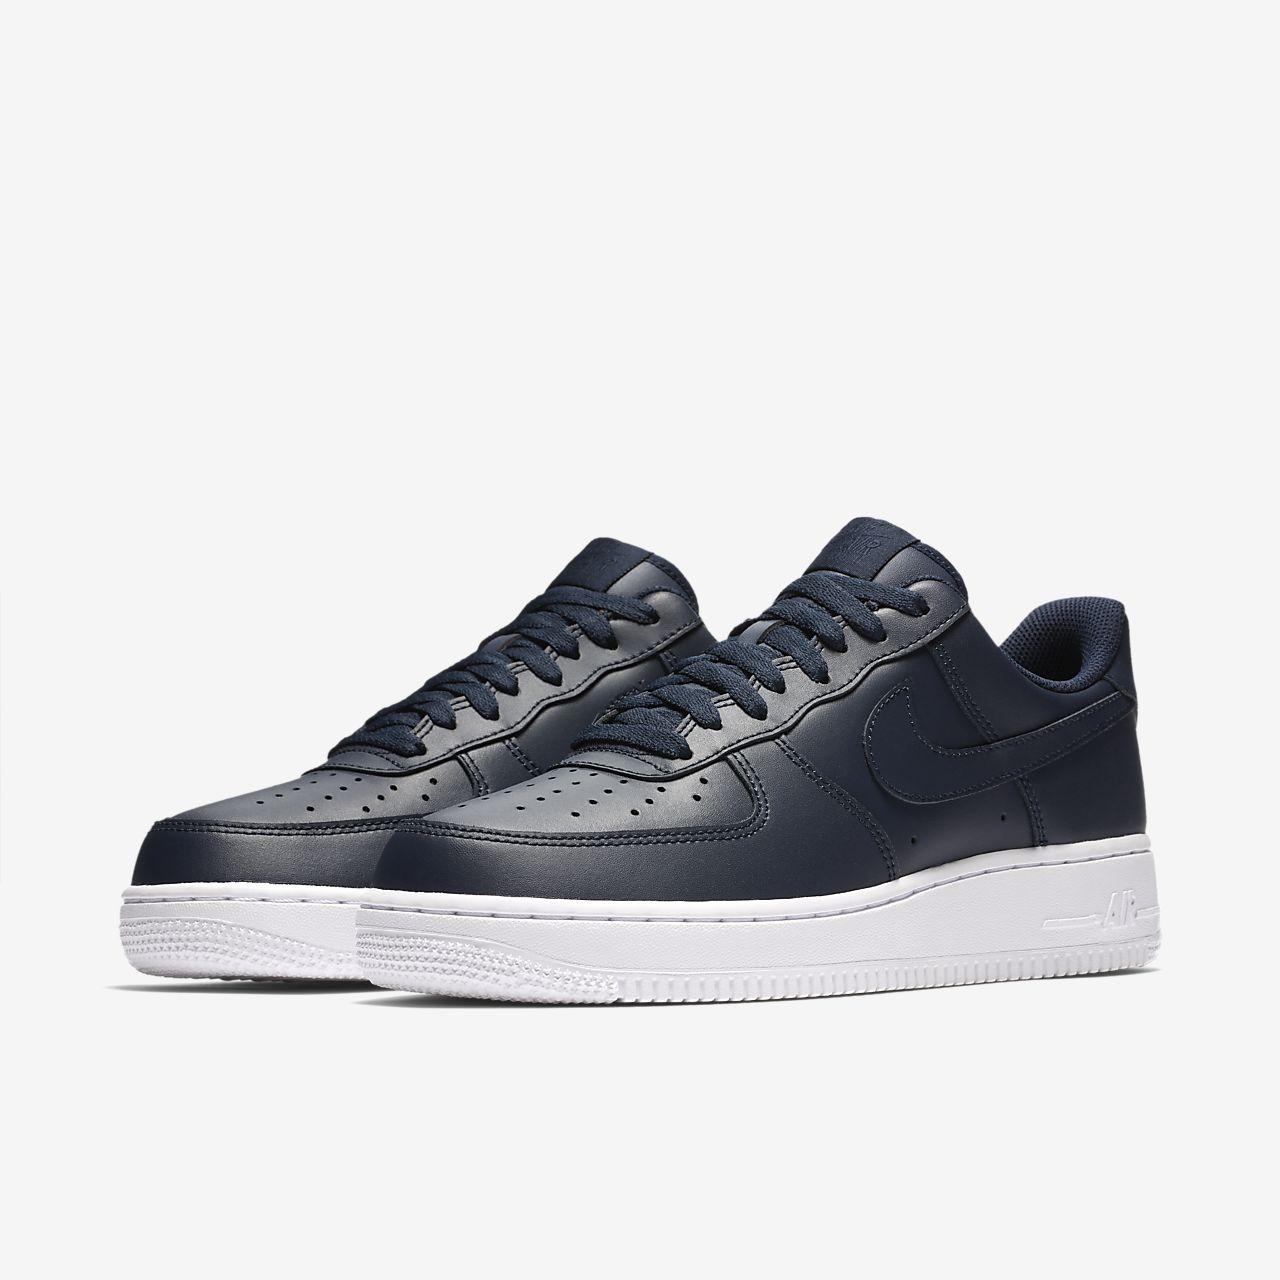 hot sale online 84ca5 5a882 ... Nike Air Force 1 07 Men s Shoe